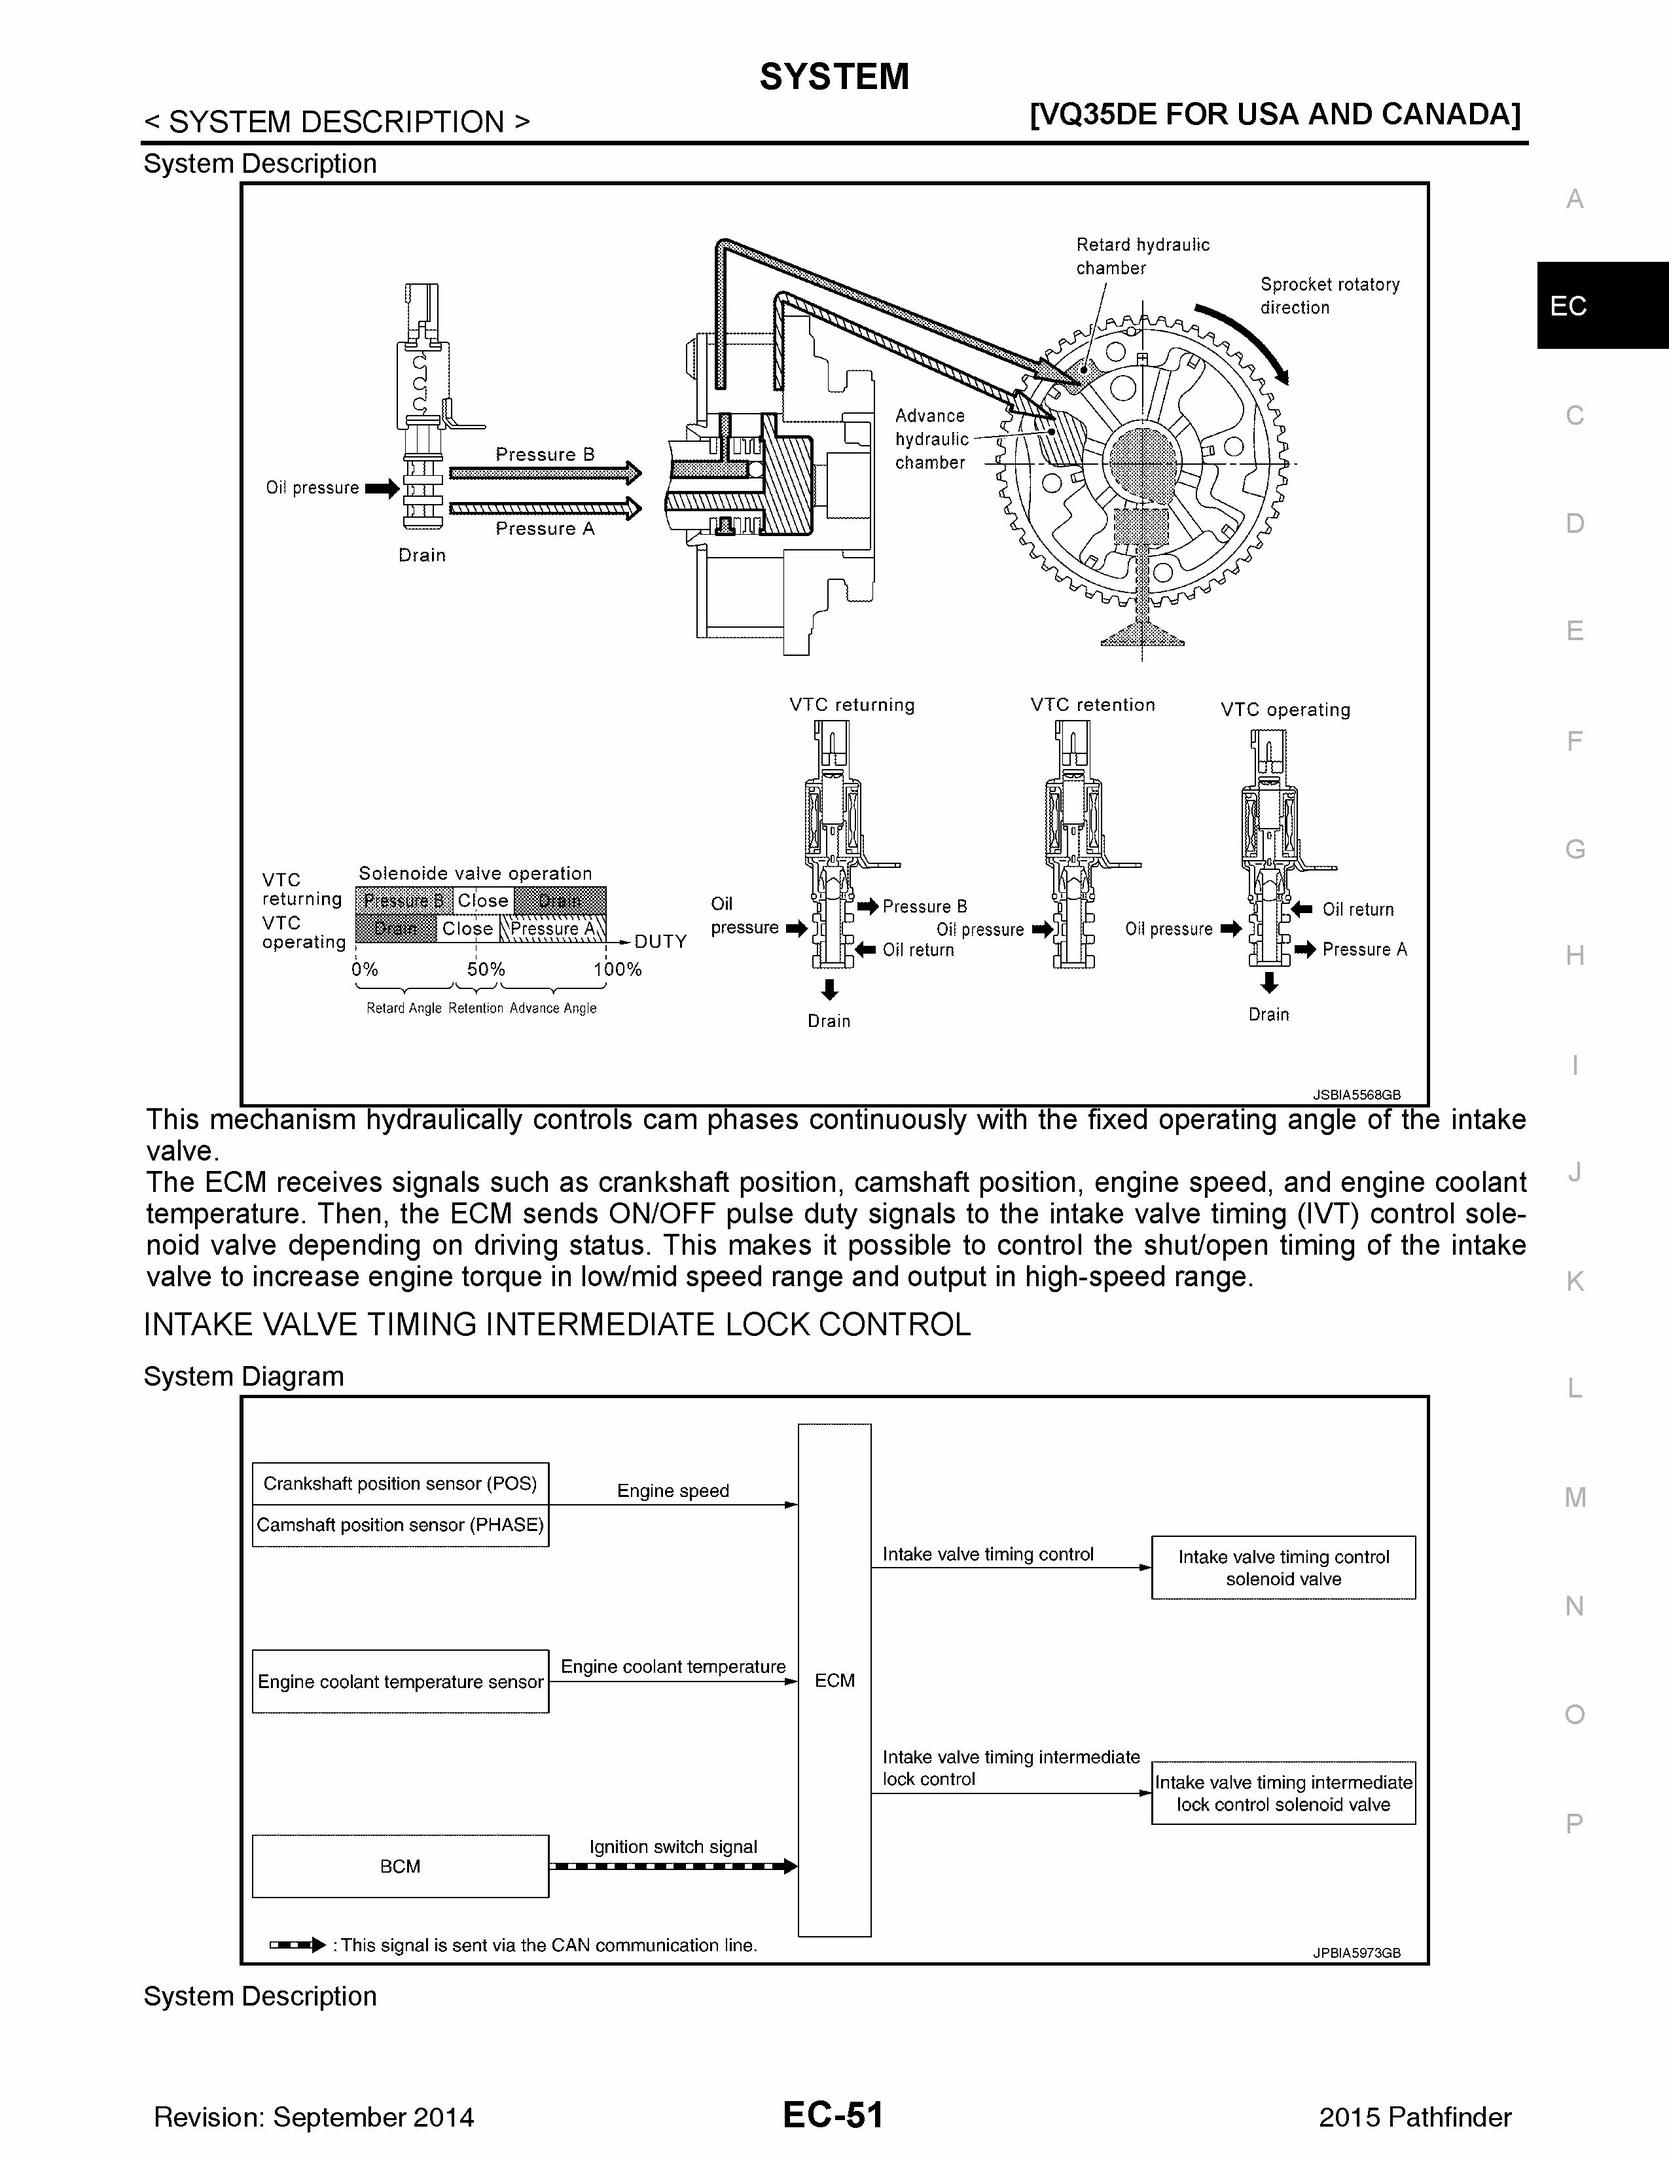 2014 Nissan Pathfinder Service Manual